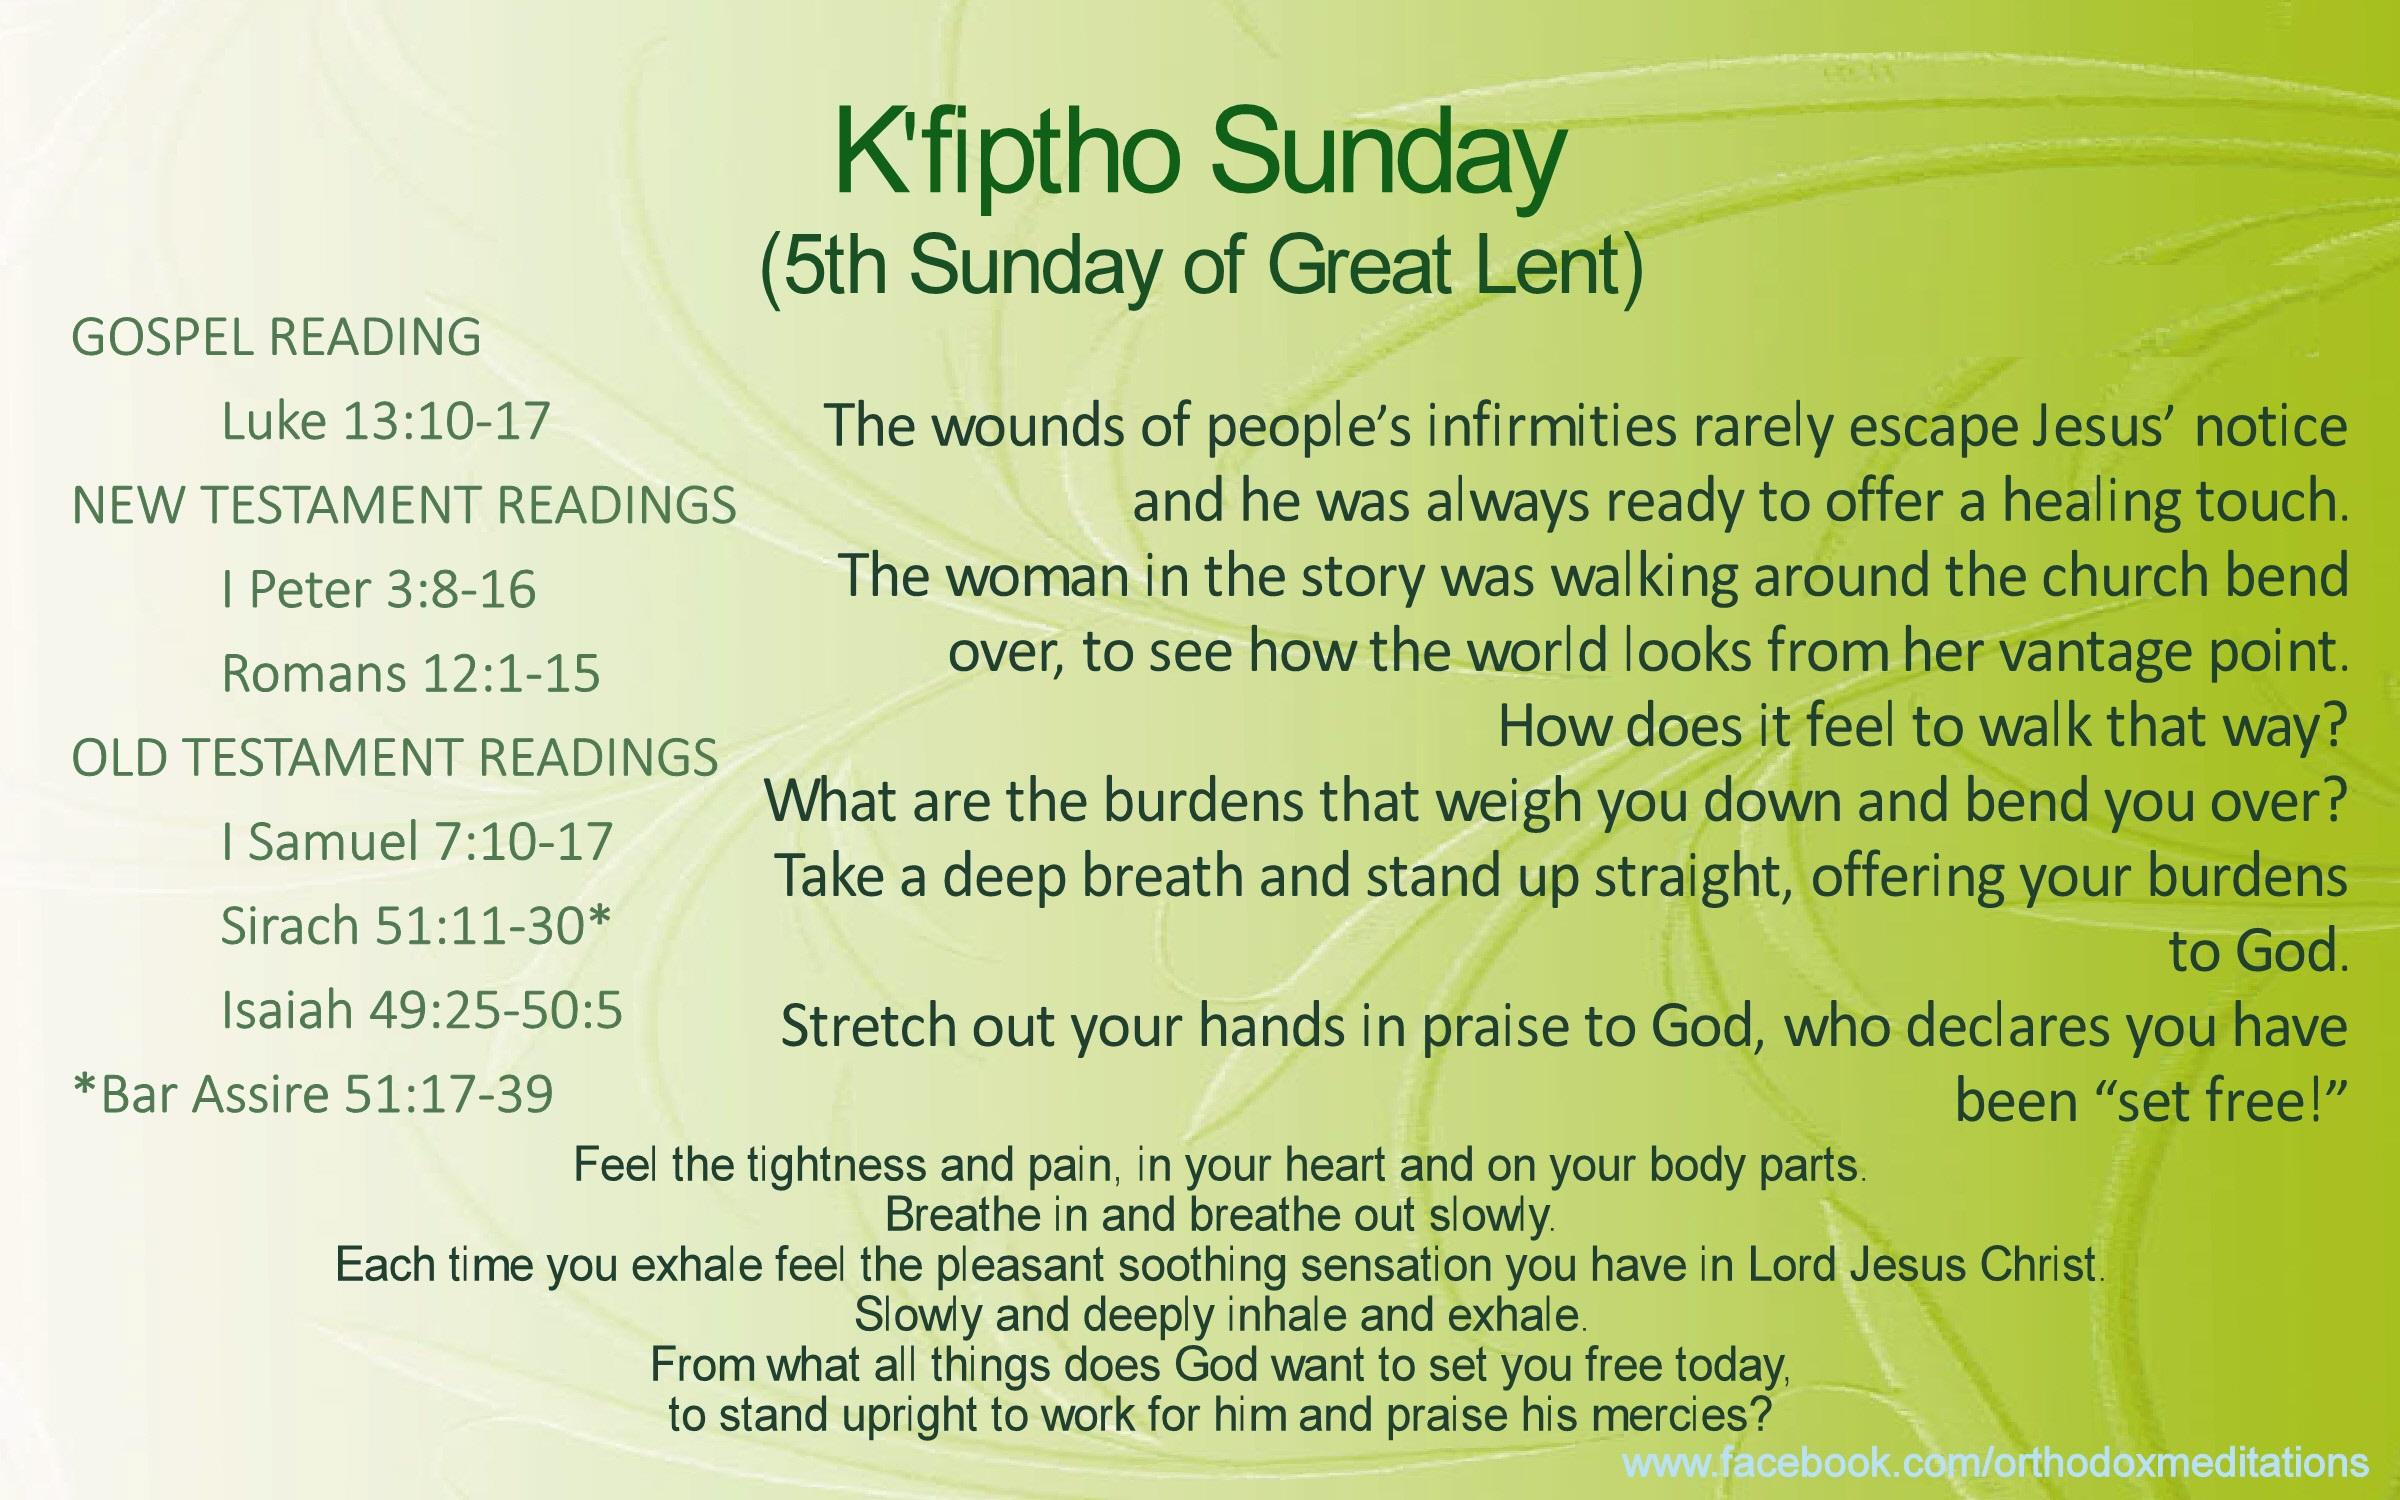 Kfiptho-Sunday-NEW_001